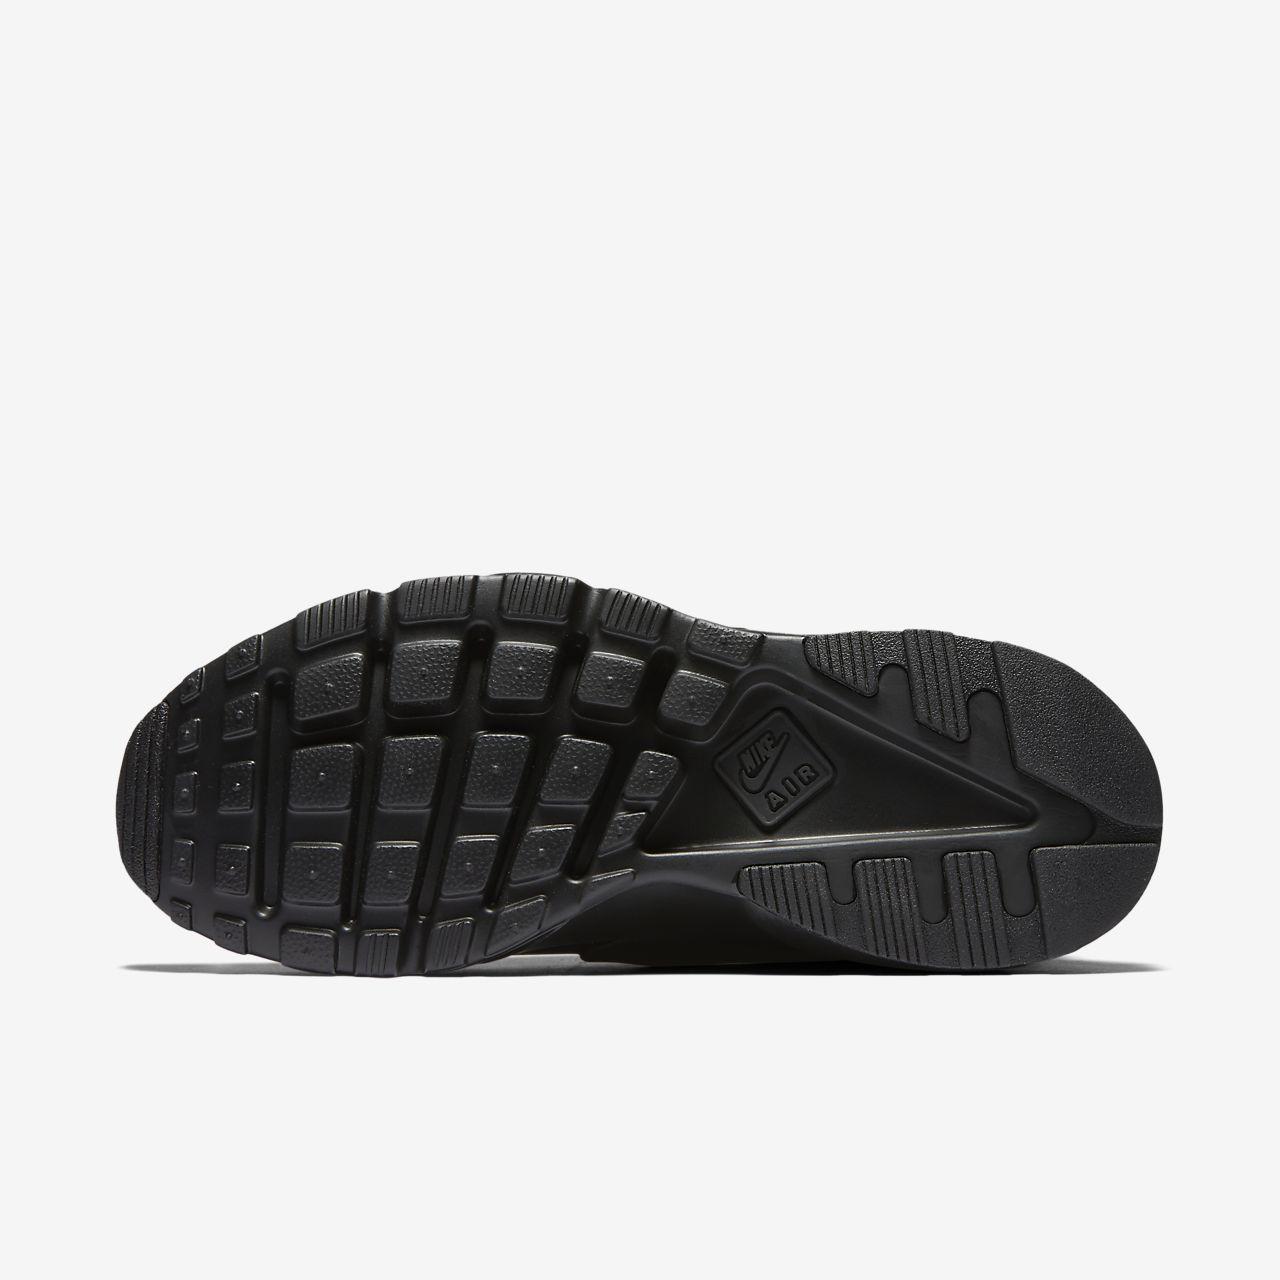 a0483bdff5f9 Nike Air Huarache Ultra Men s Shoe. Nike.com DK